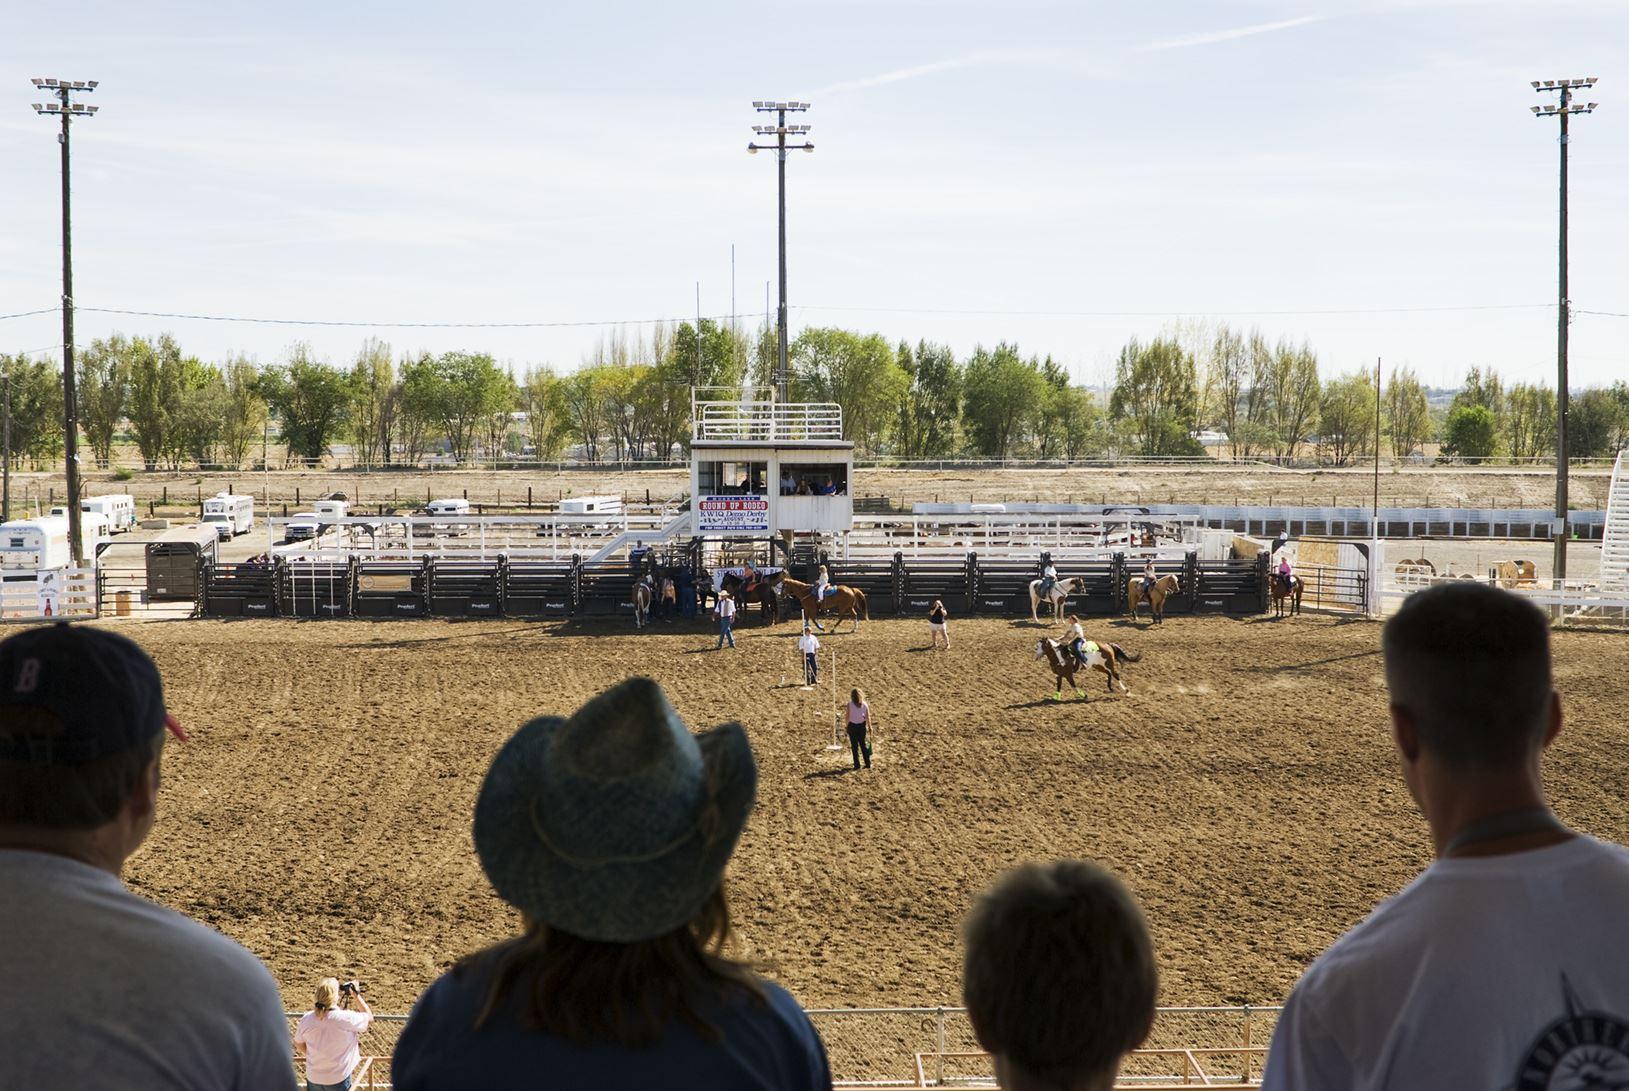 Rodeo Arena 800 Per Day